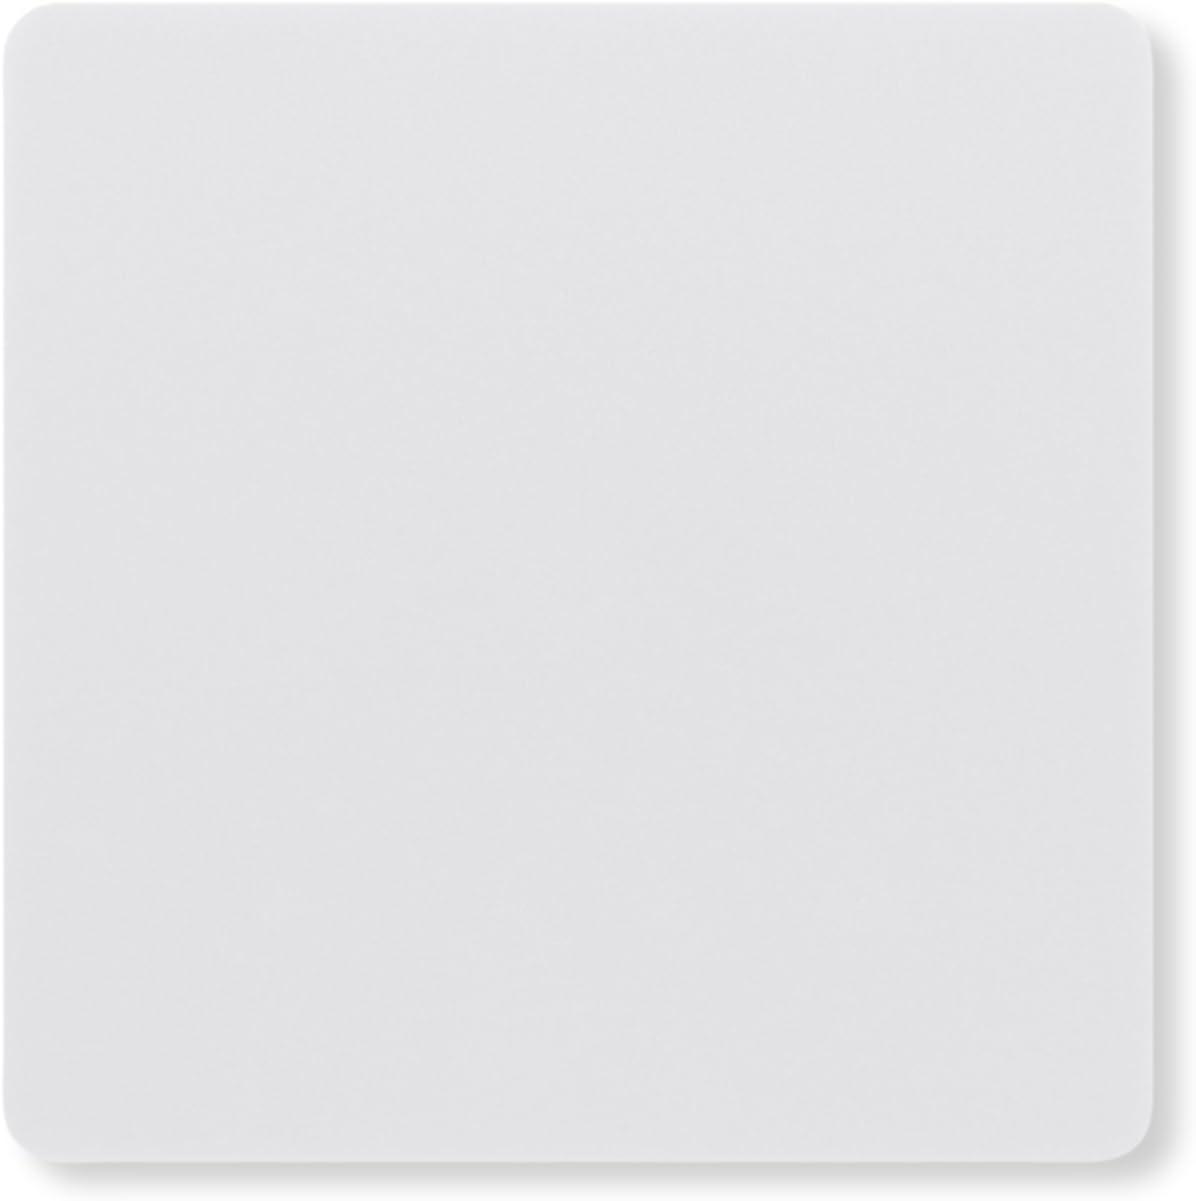 PME FFP573 Tappeto in Spugna Bianco